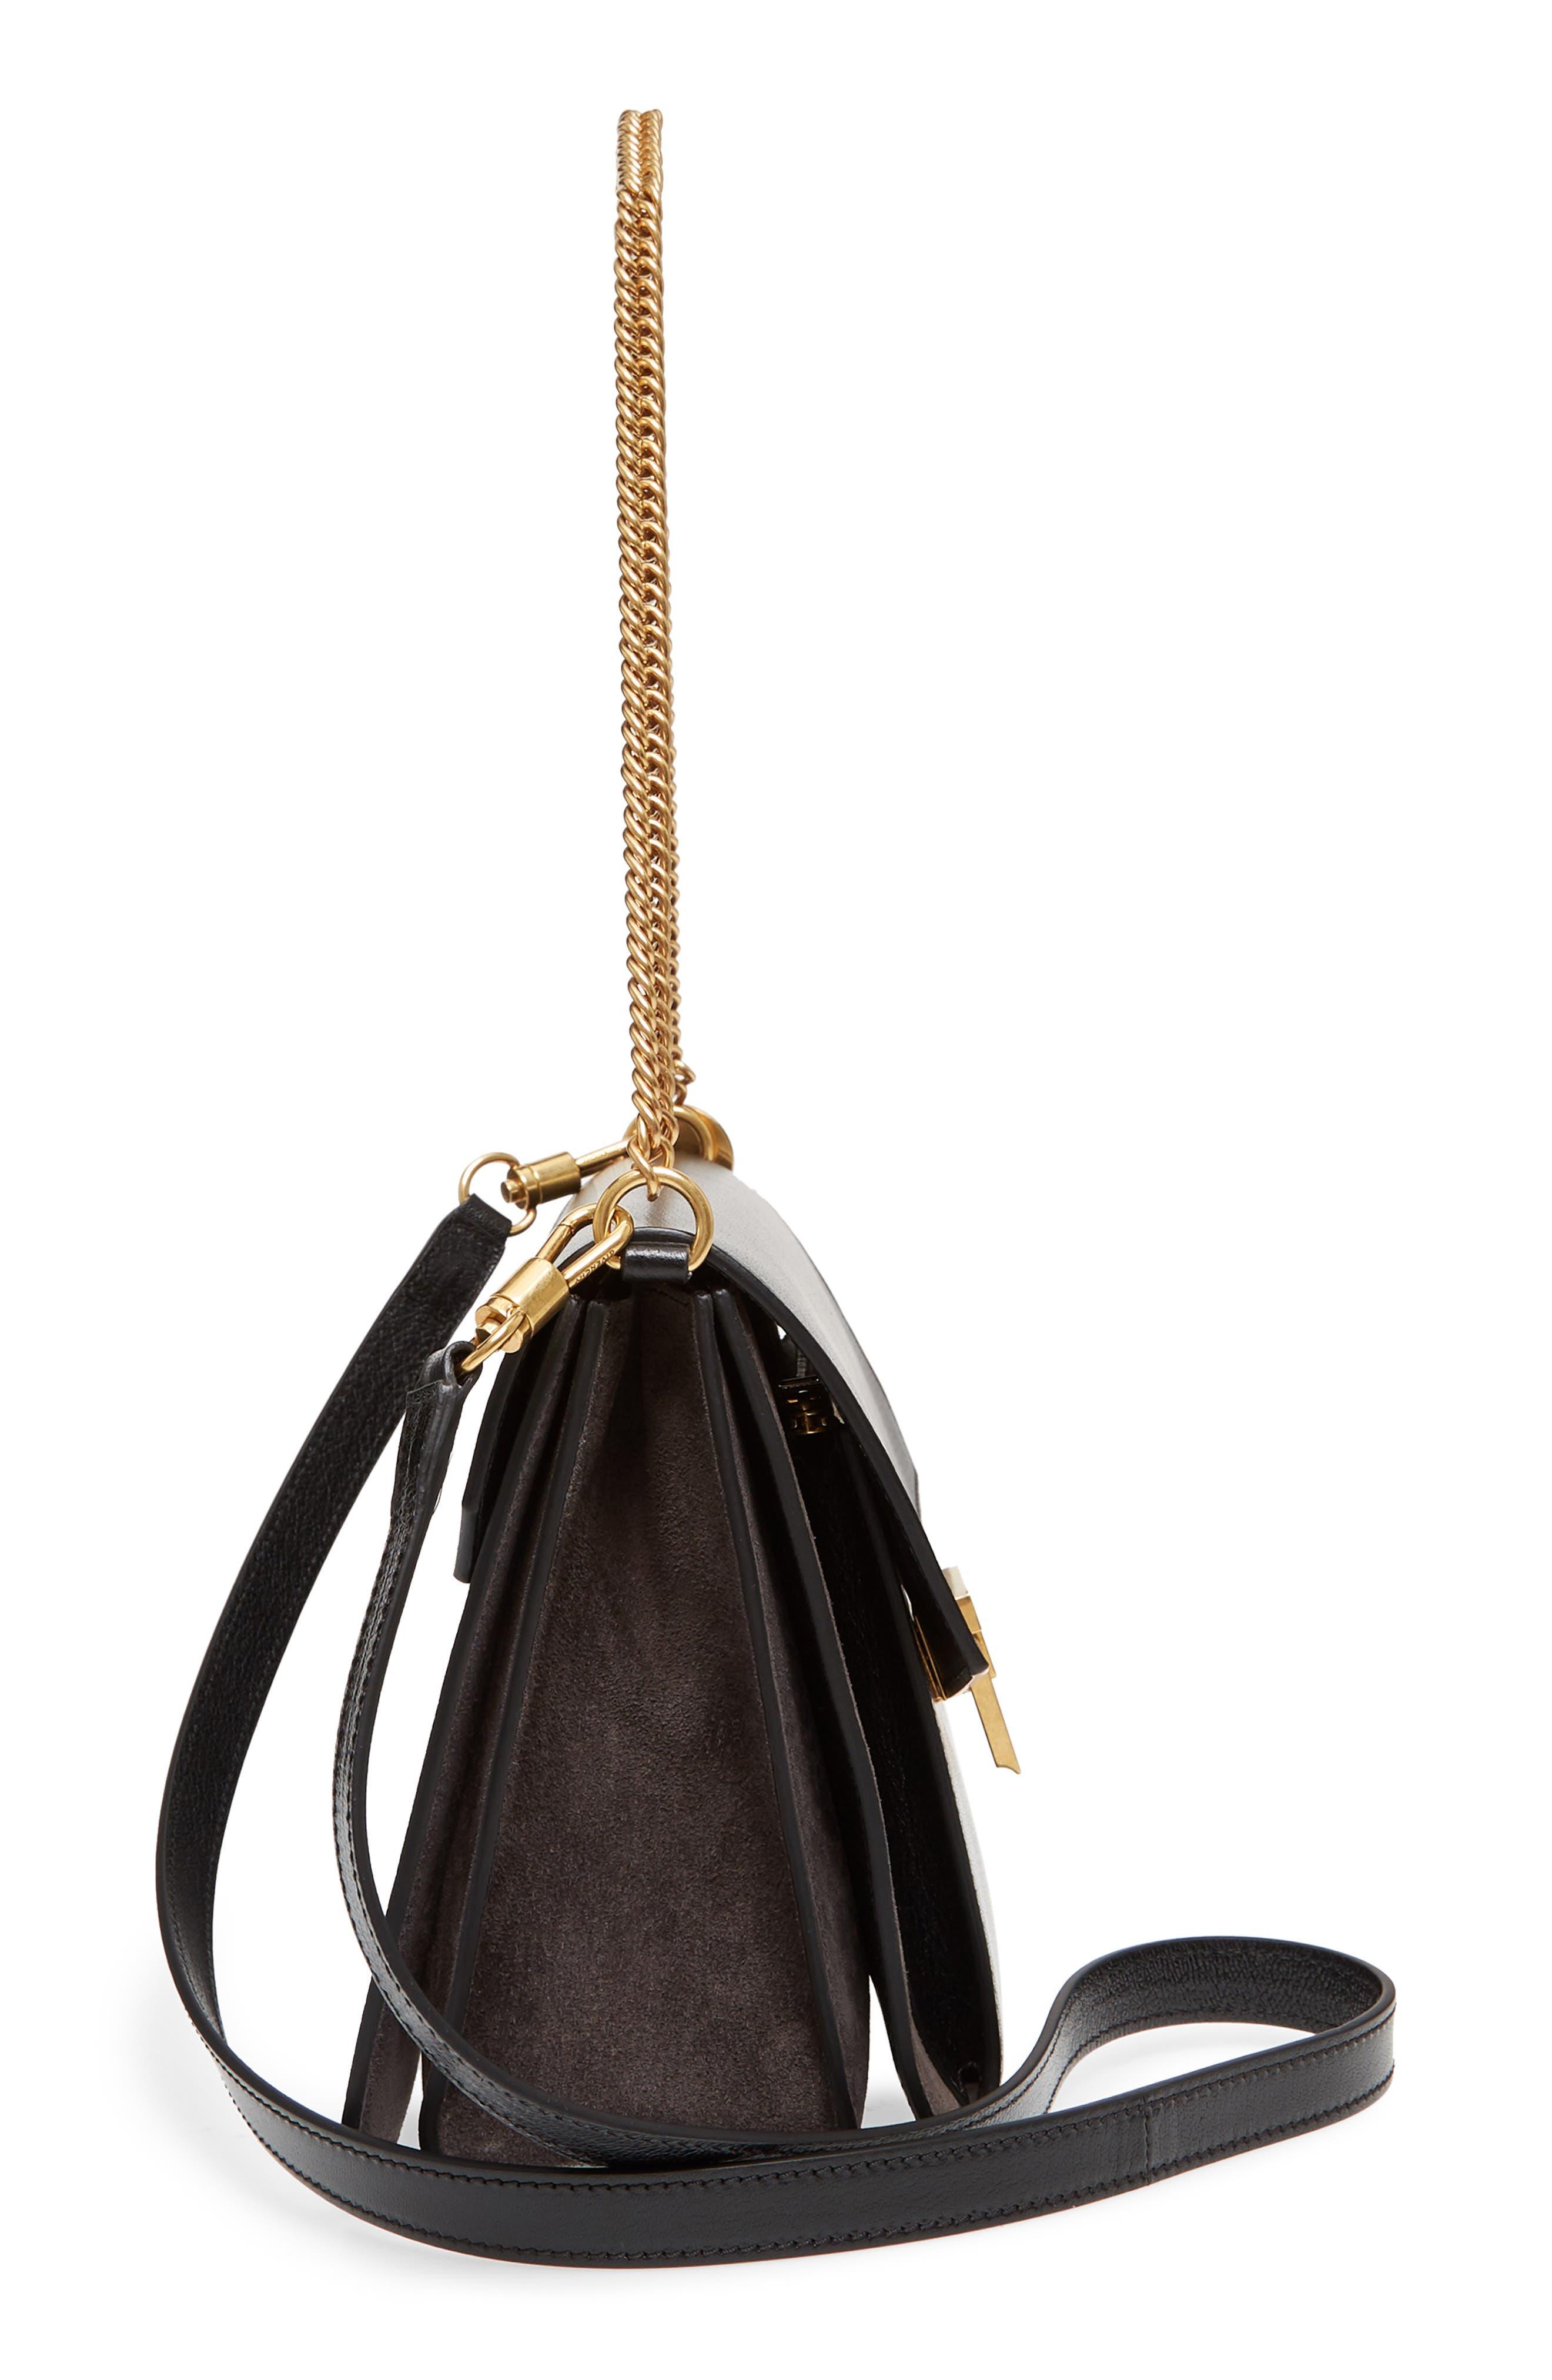 Medium GV3 Leather Crossbody Bag,                             Alternate thumbnail 5, color,                             BLACK/ GREY